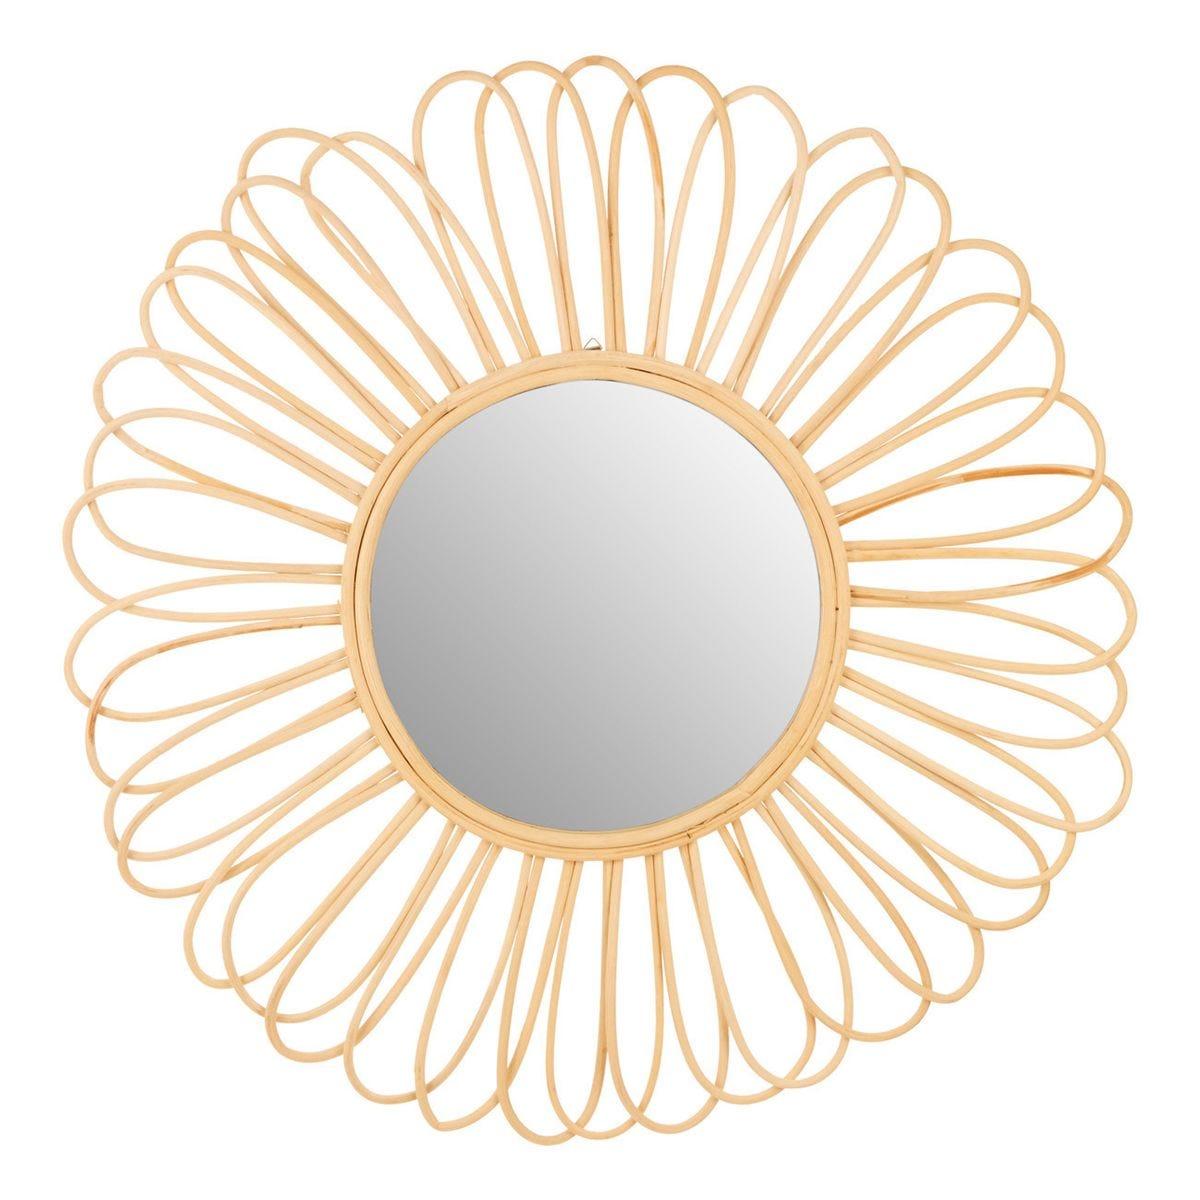 Round Wall Mirror - Petal Design Natural Rattan